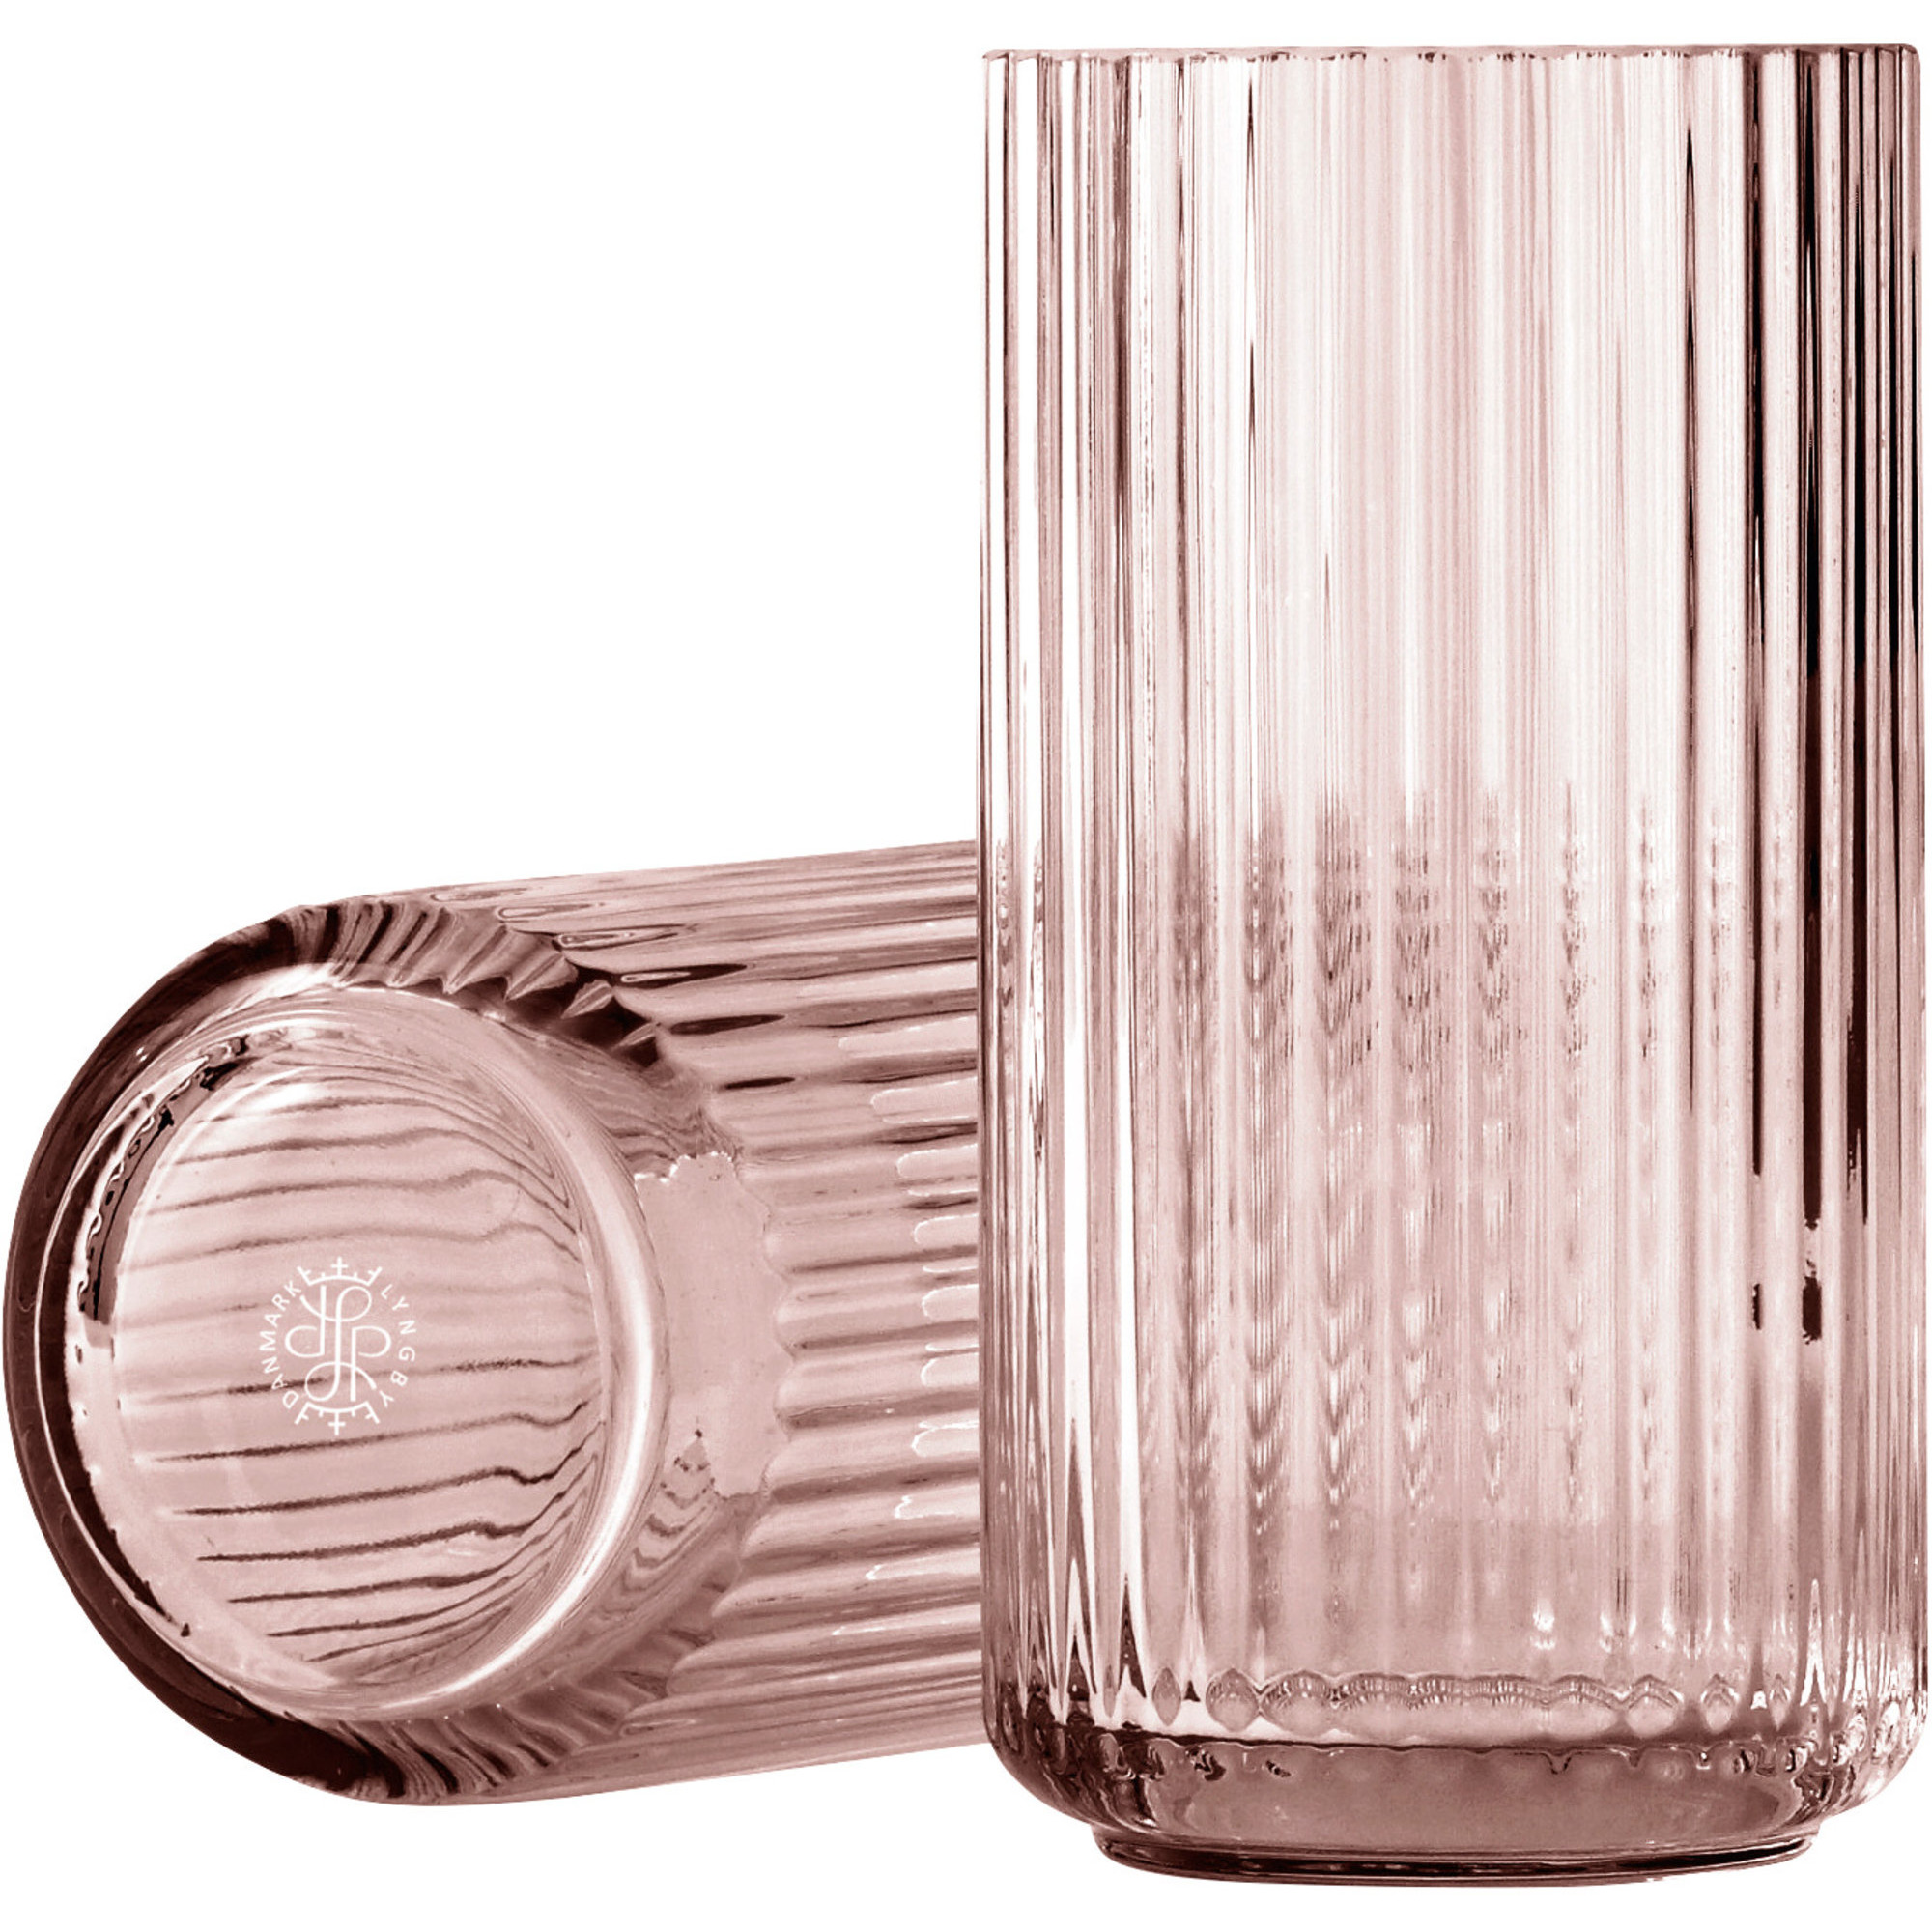 Lyngby Porcelæn Vas 20 cm., Glas Burgundy